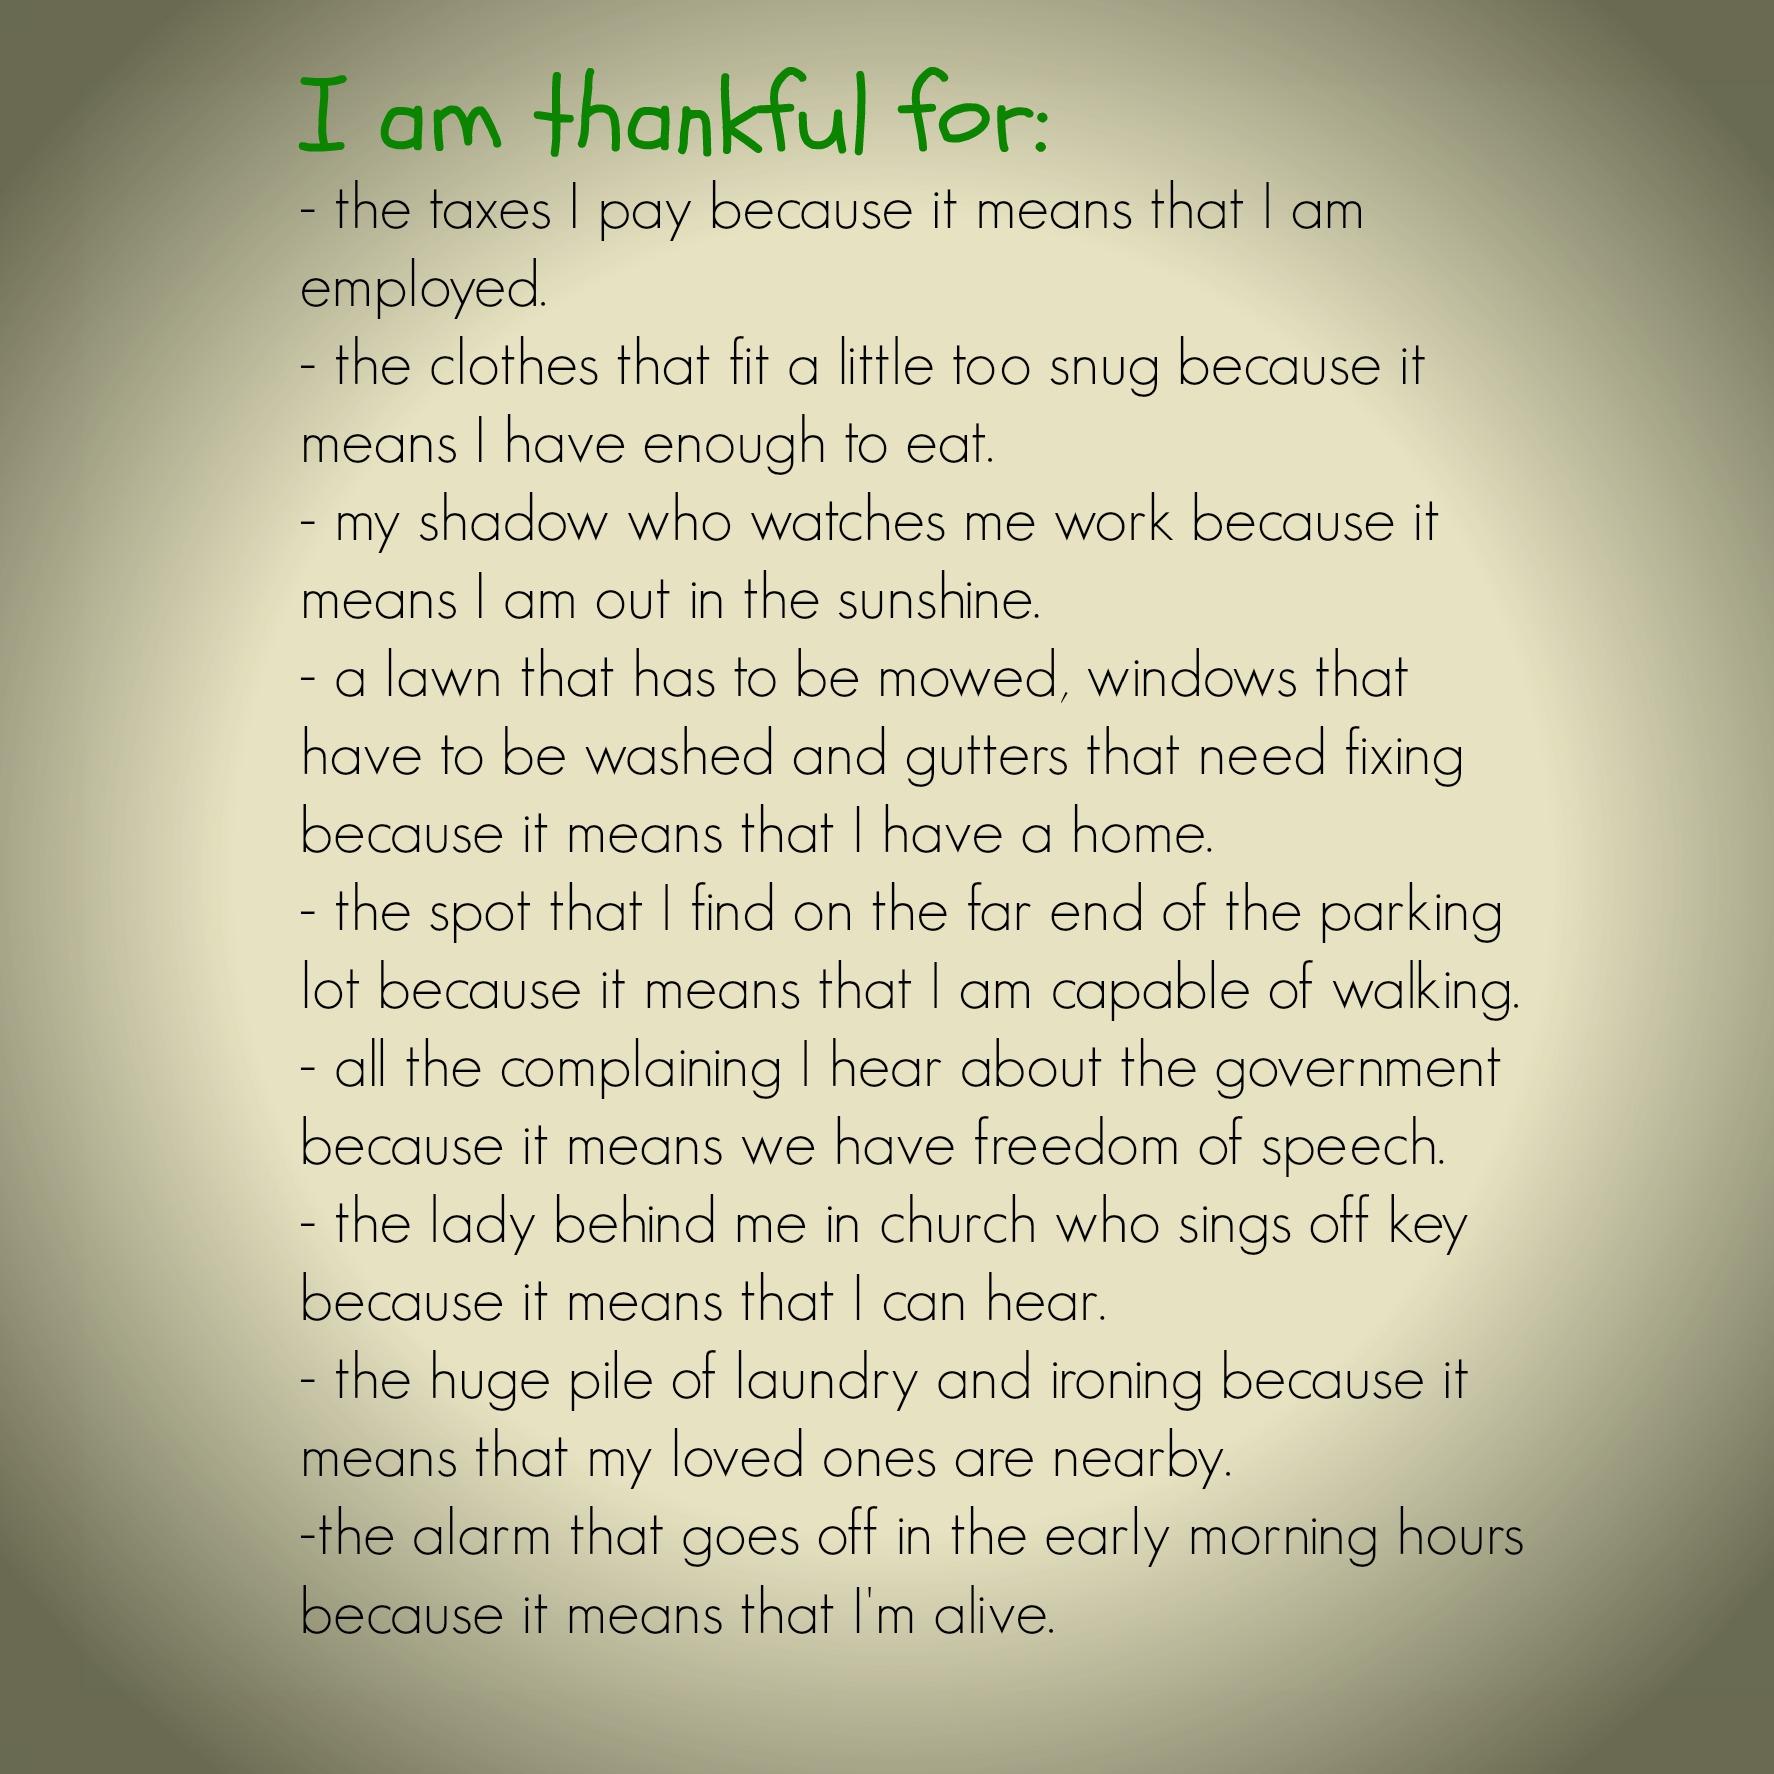 Attitude Of Gratitude Fortune Cookies (church, Bible